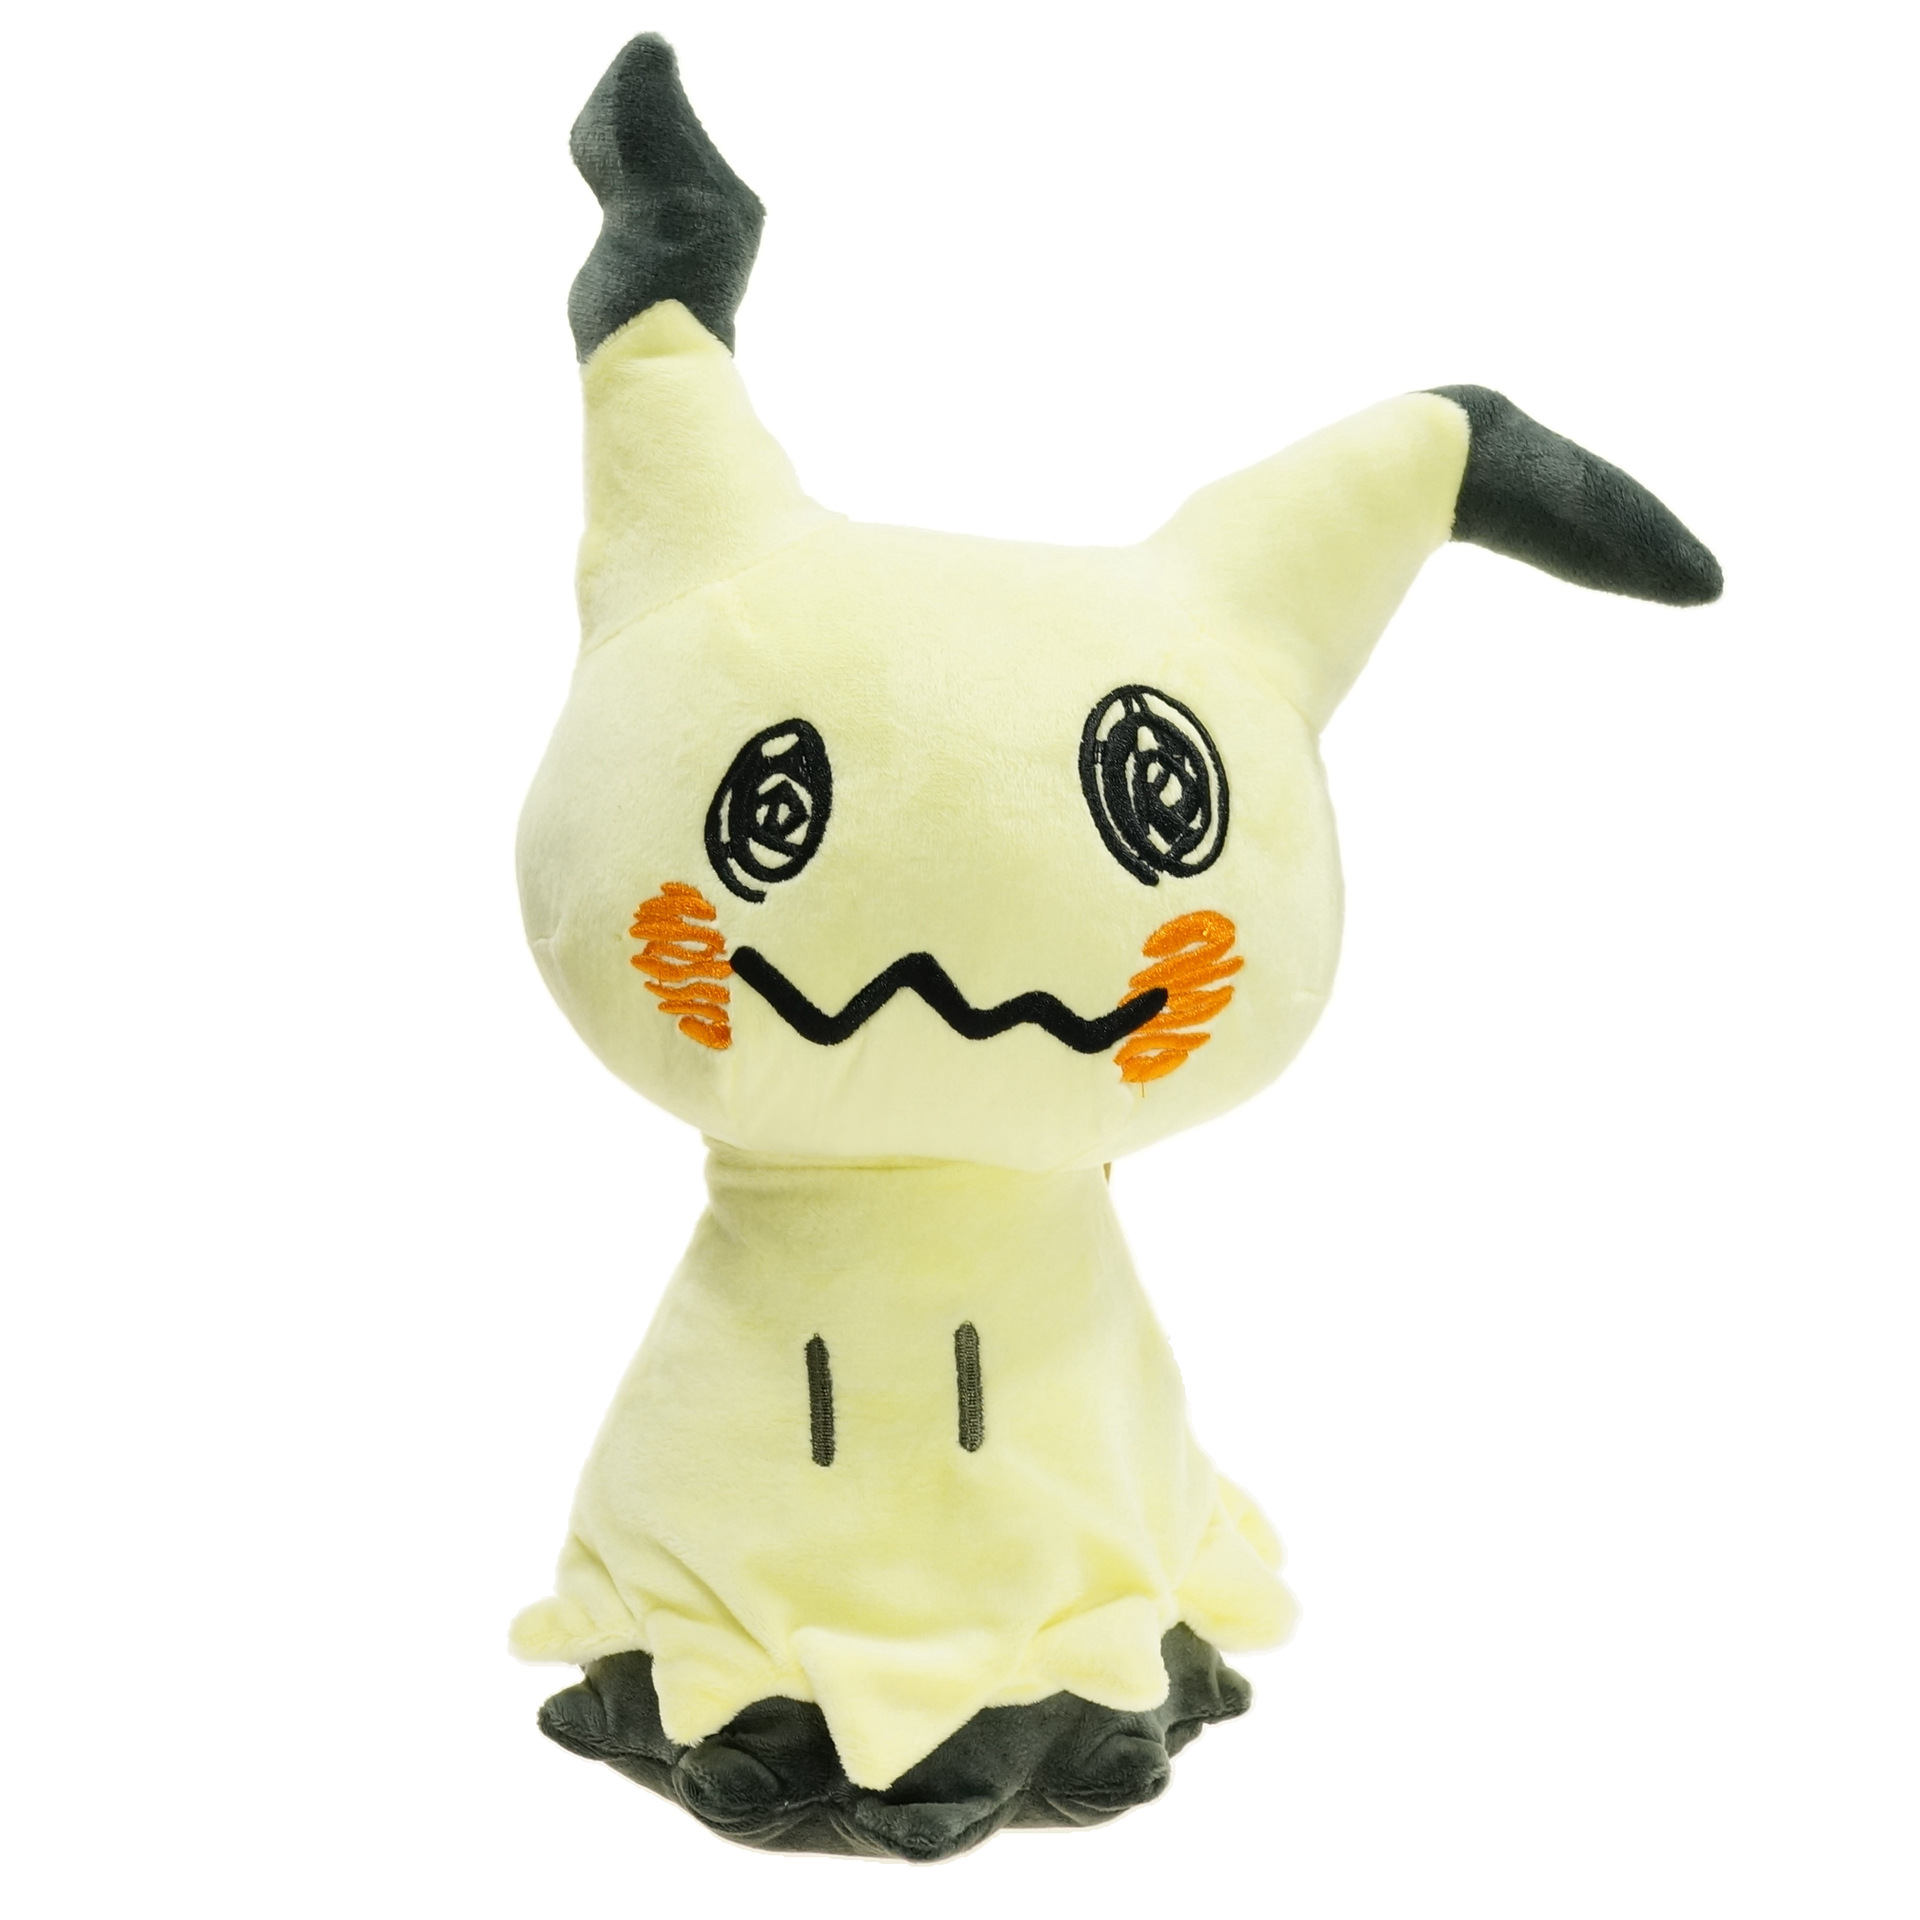 Pikachu Pokemon Pocket Monster 14/20/40CM Plush Toys Stuffed Doll Soft Mini Q Children Kids Christmas Gifts Cosplay